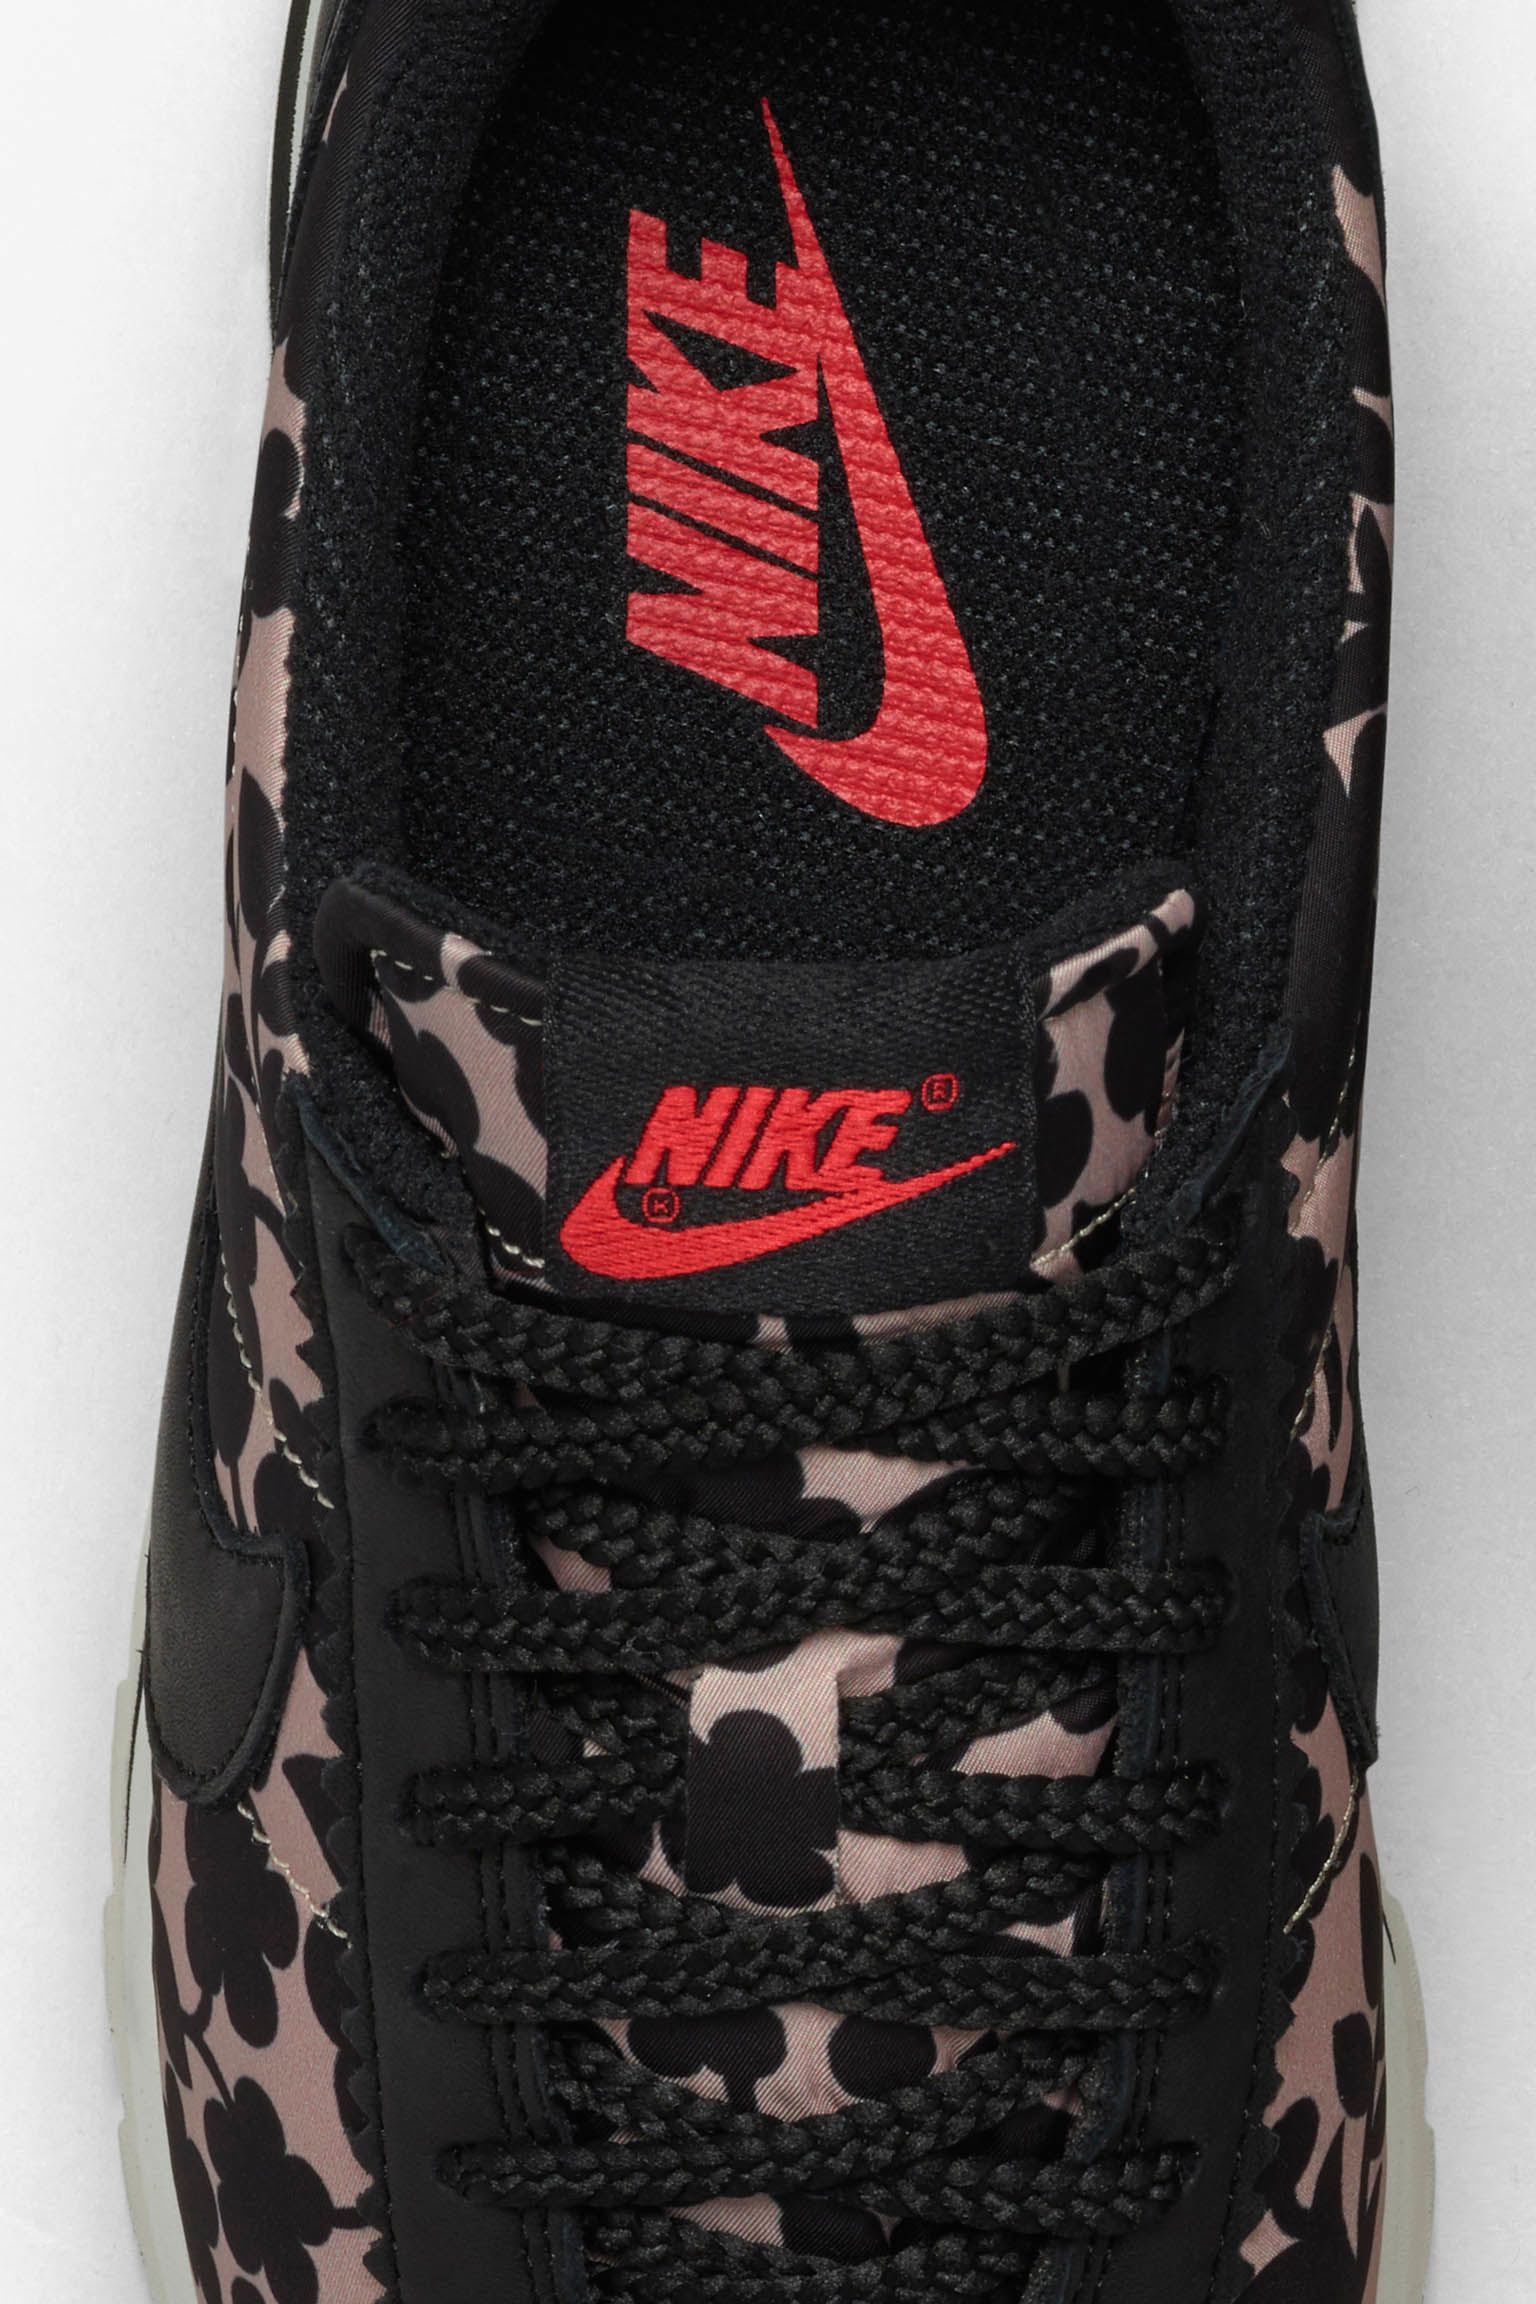 Liberty x Women's Nike Classic Cortez 'Cameo'